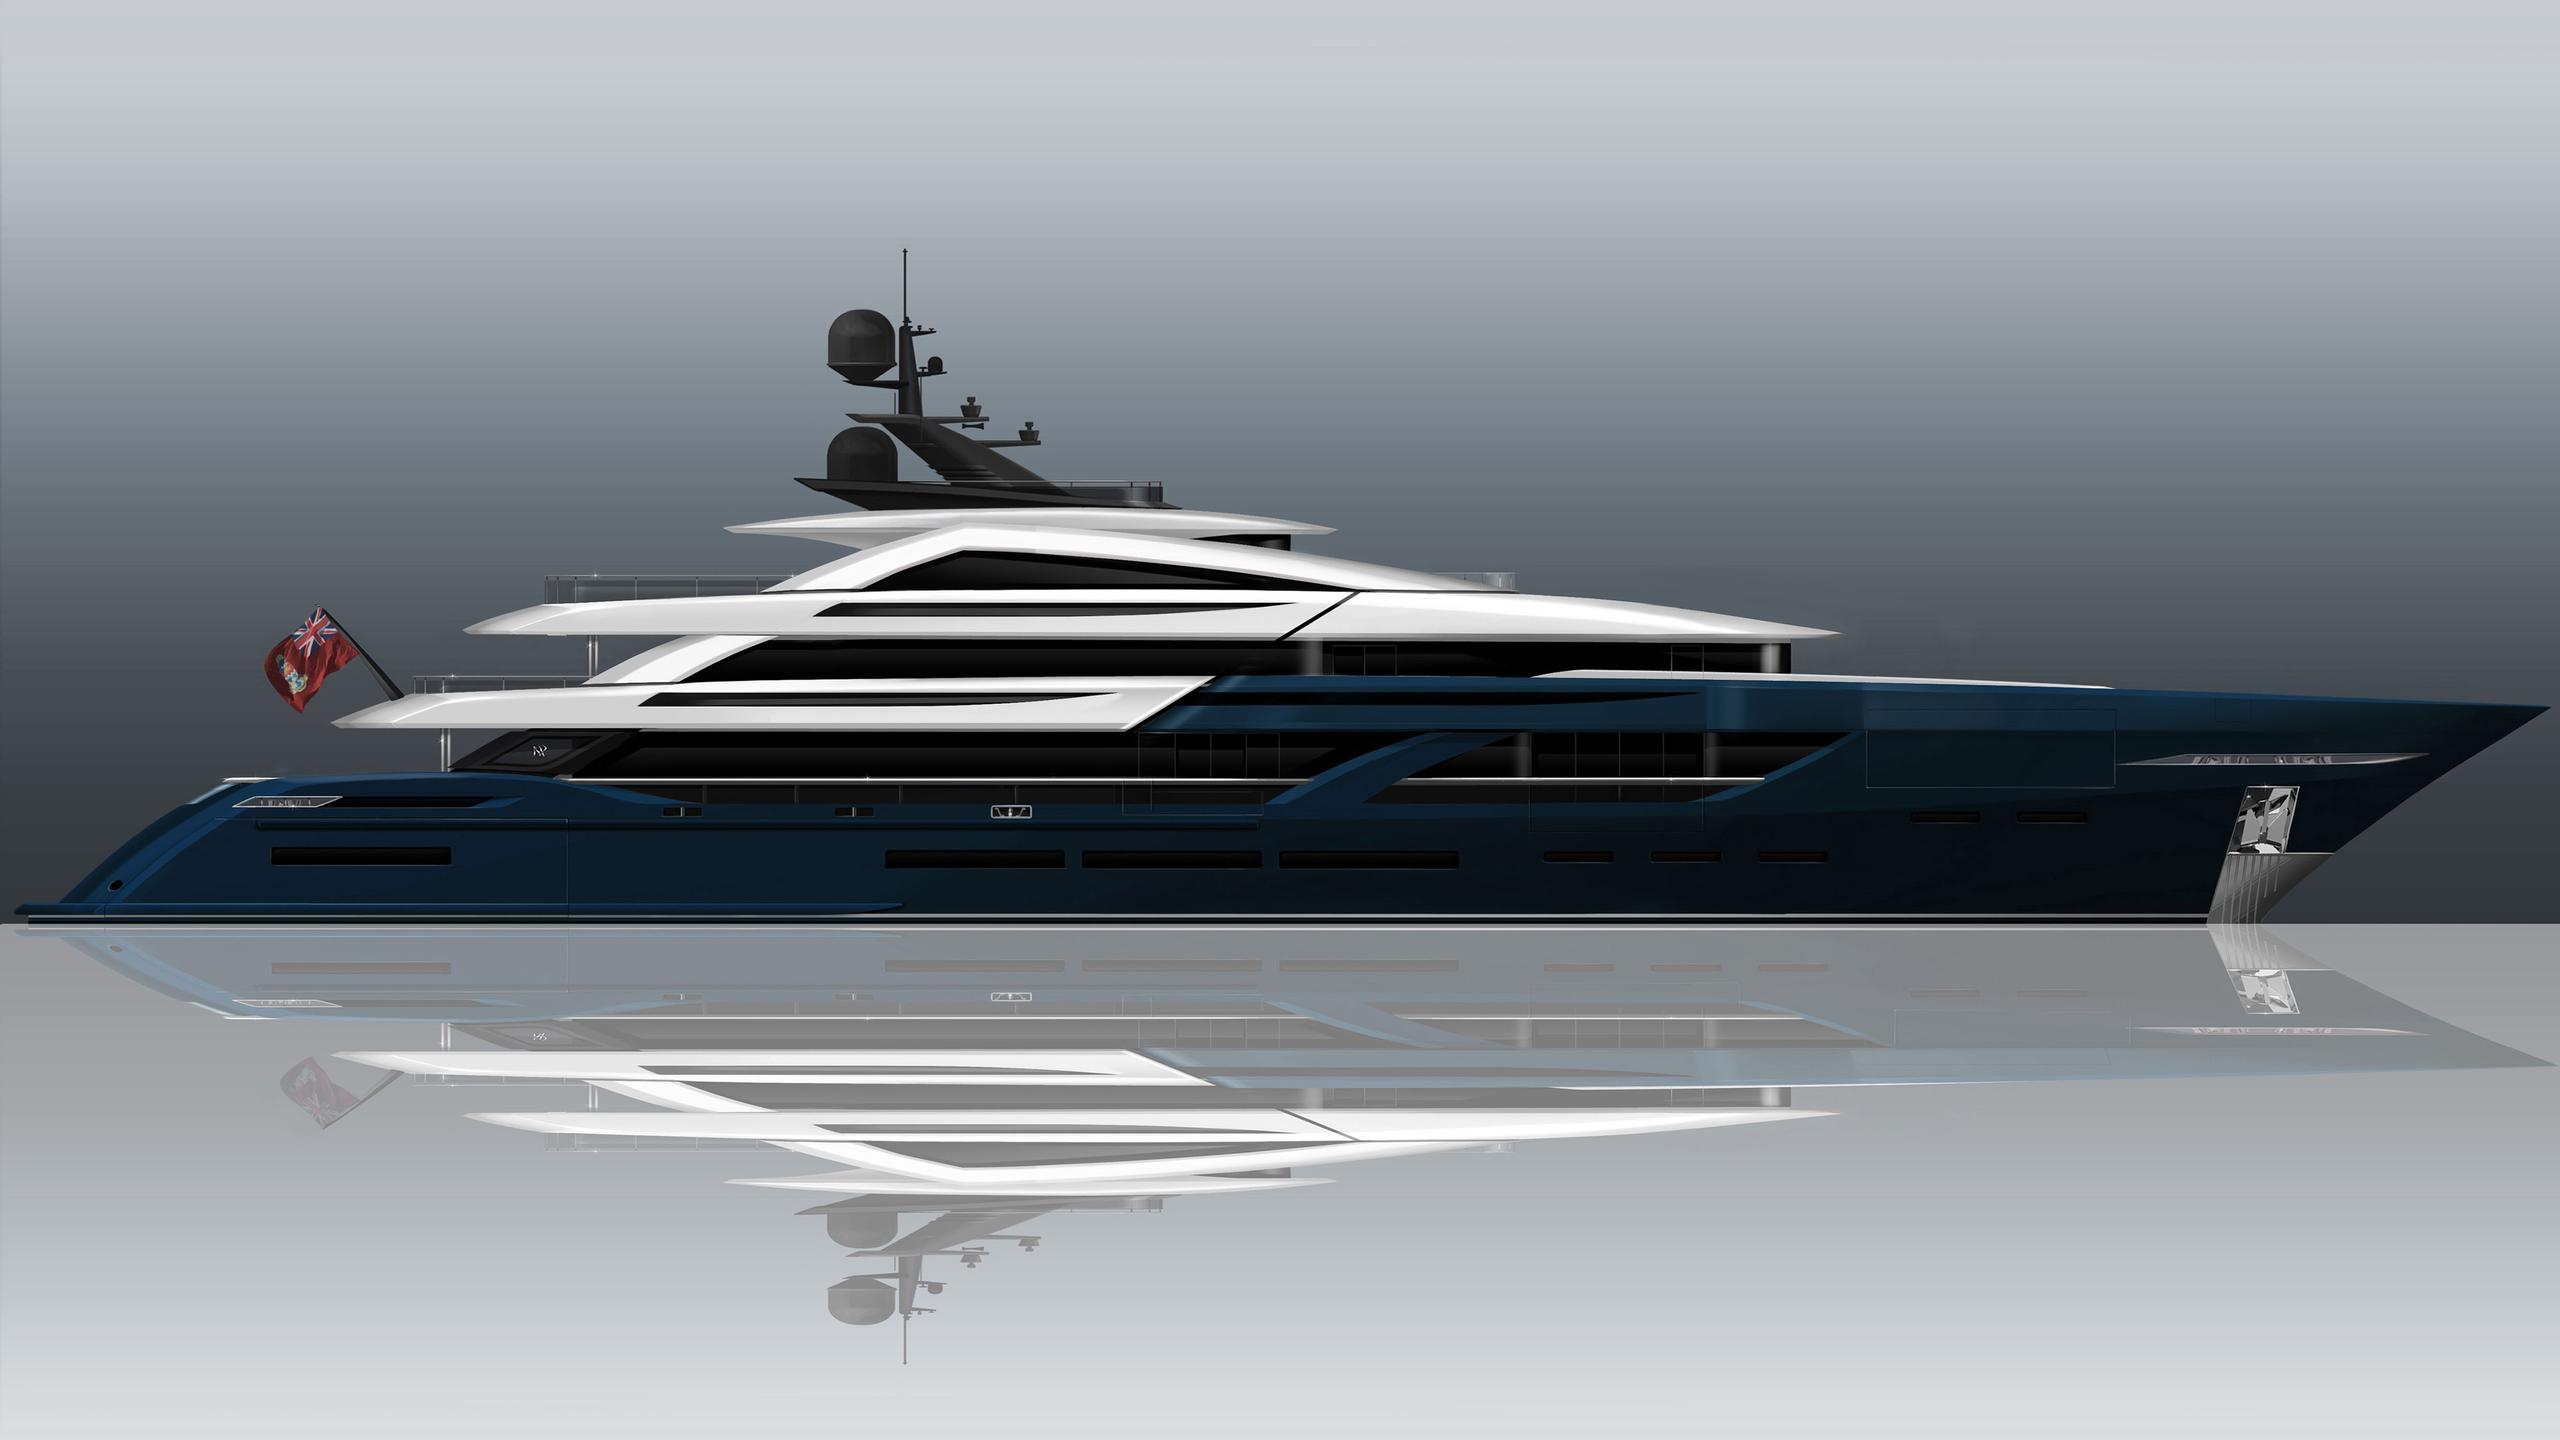 rocco motoryacht isa yachts 65m 2021 rendering